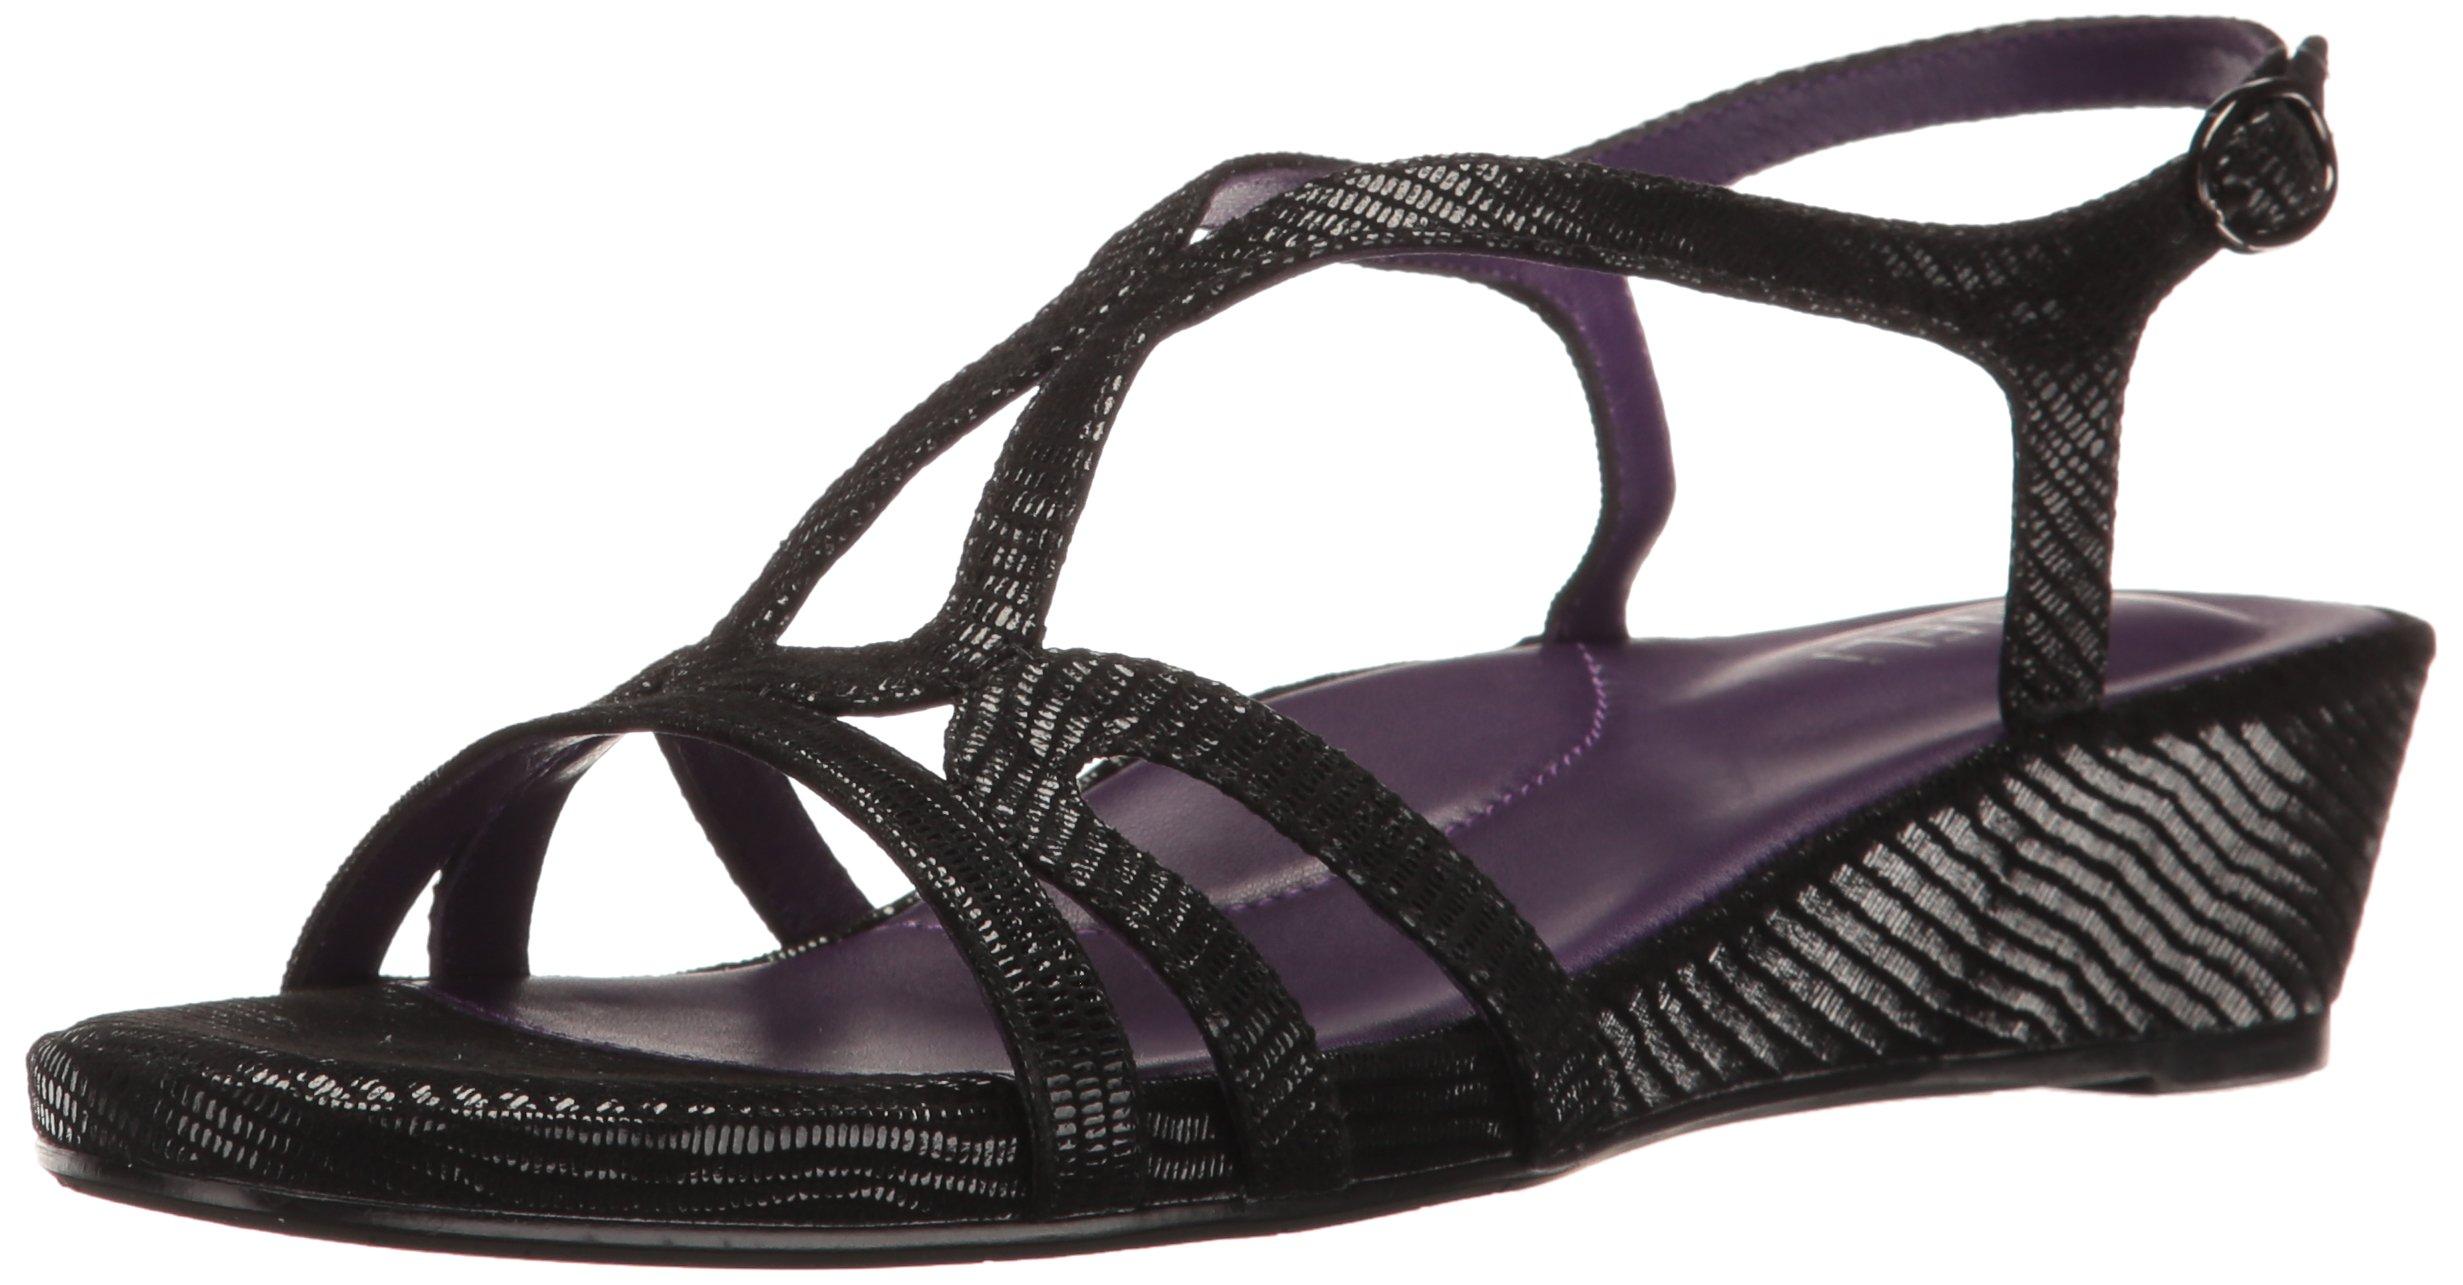 VANELi Women's Daffy Wedge Sandal, Black Miniliz Print/Gunmetal Buckle, 11 M US